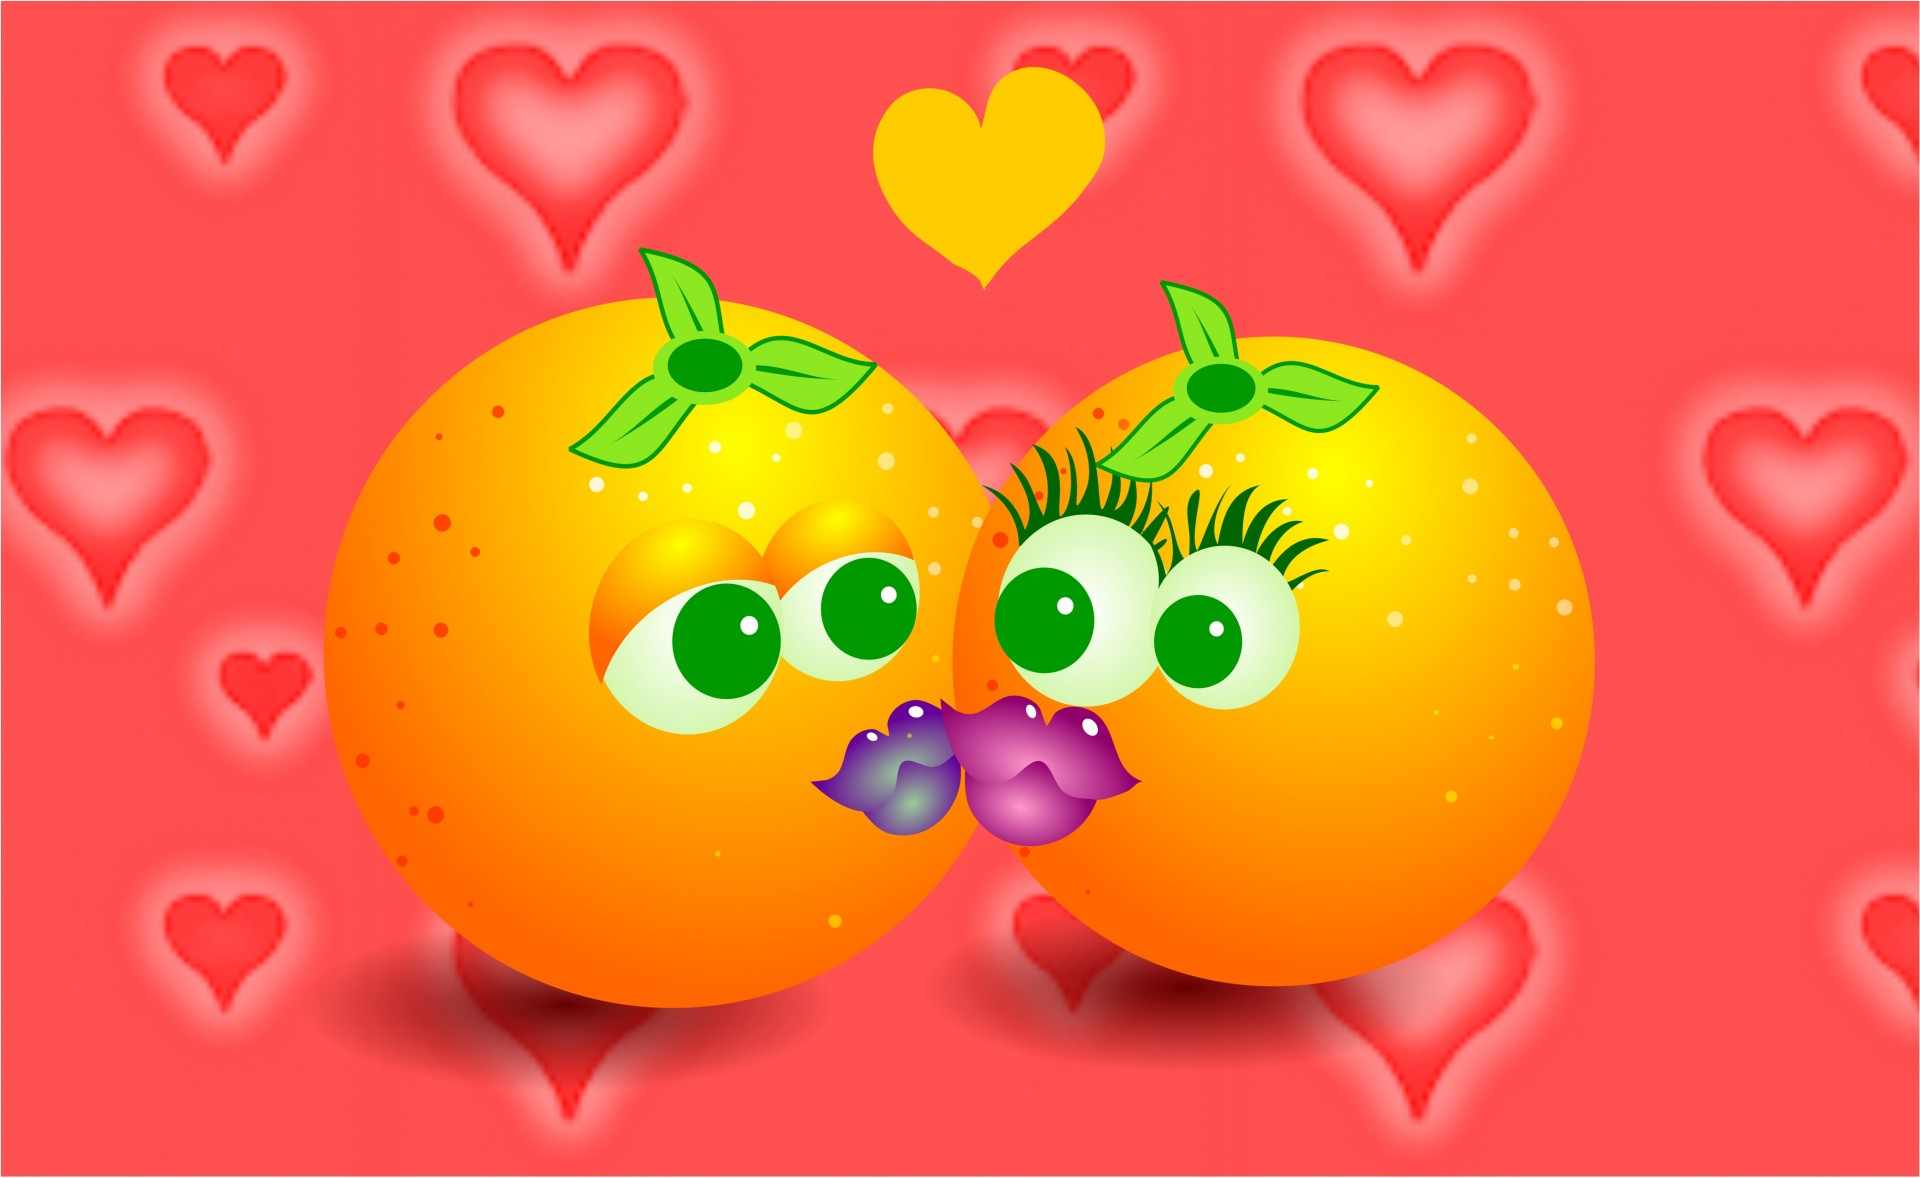 картинка с поцелуйчиками любимому